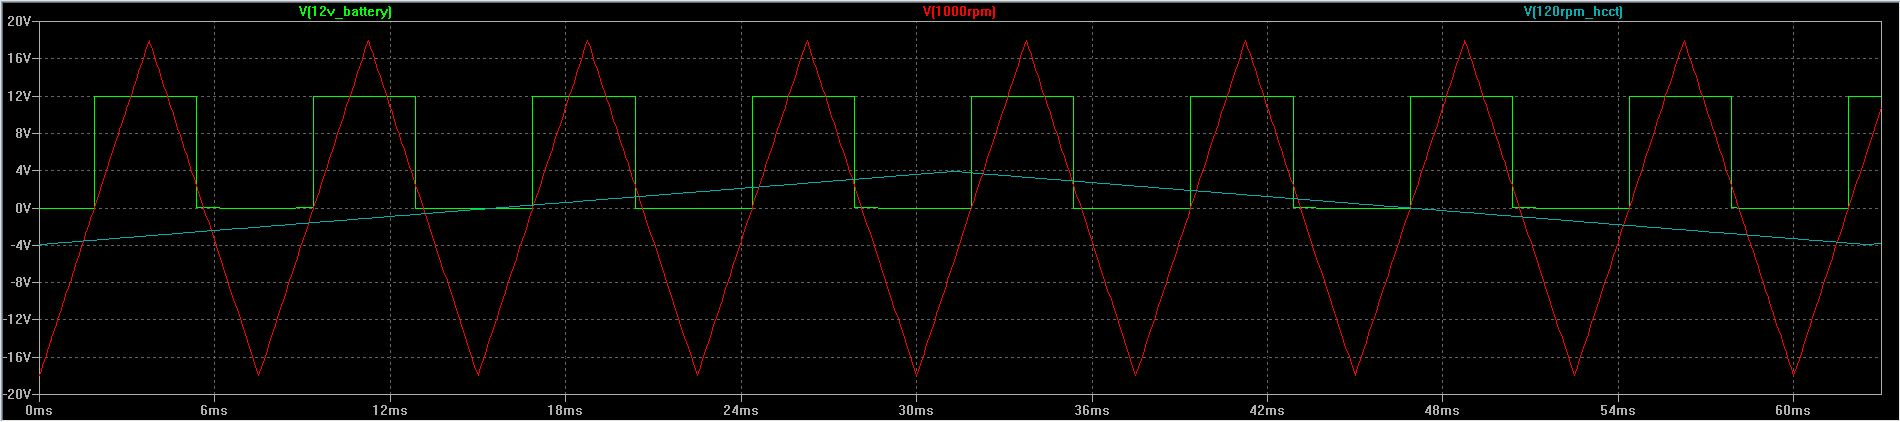 HCCT Mag 12V battery operation